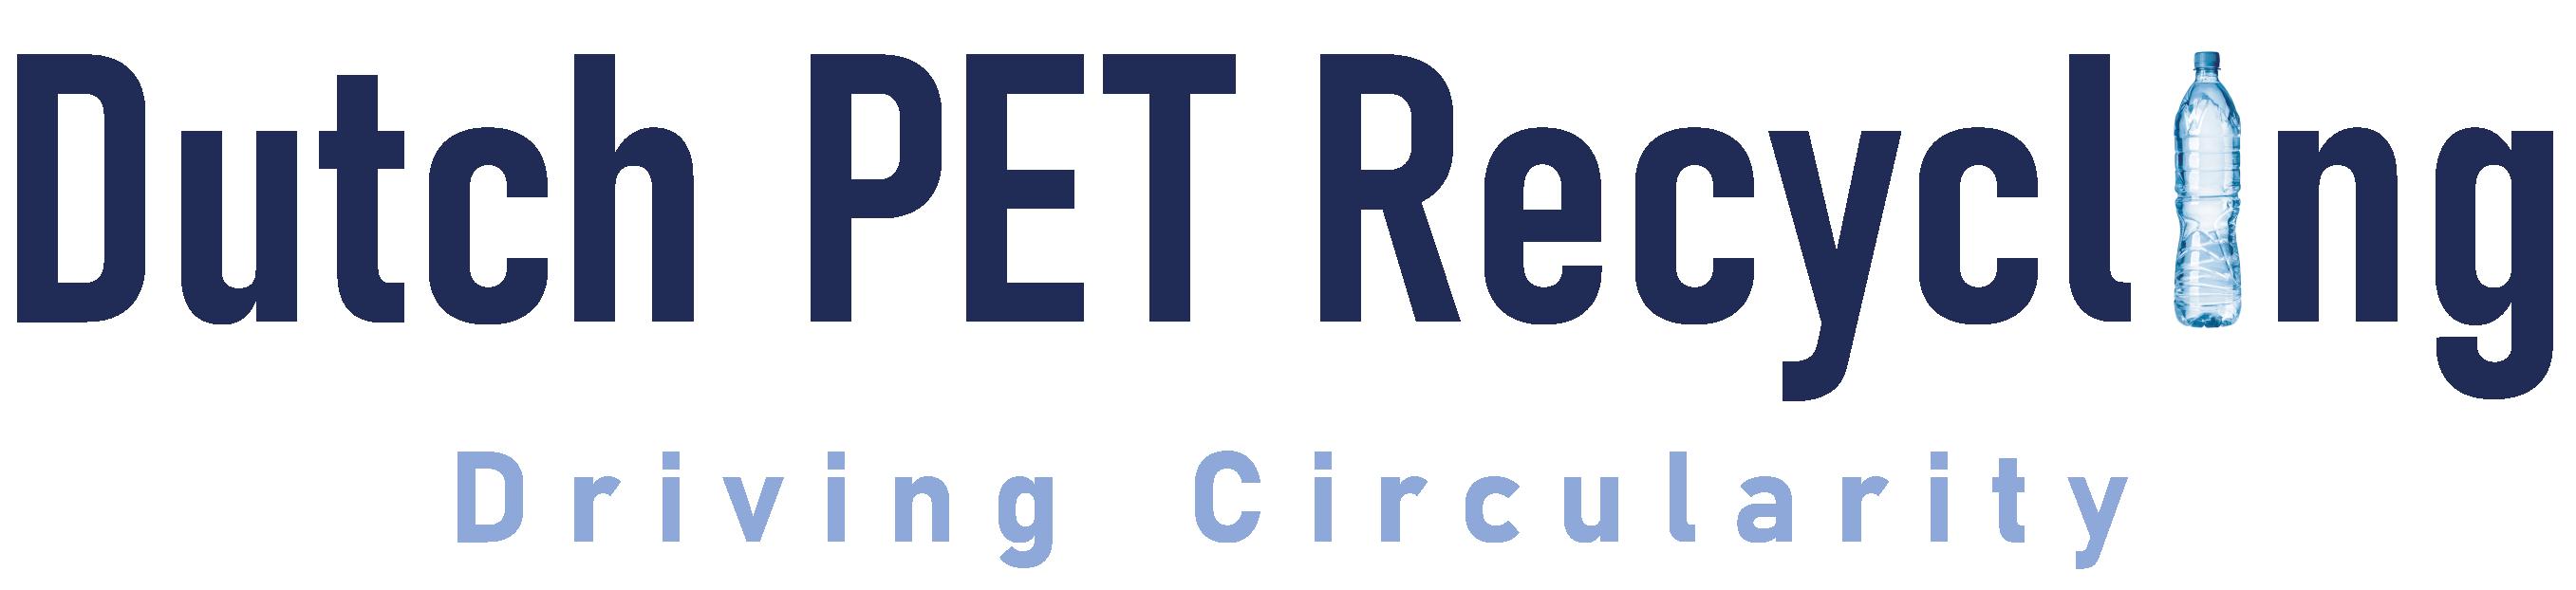 DutchPETRecycling